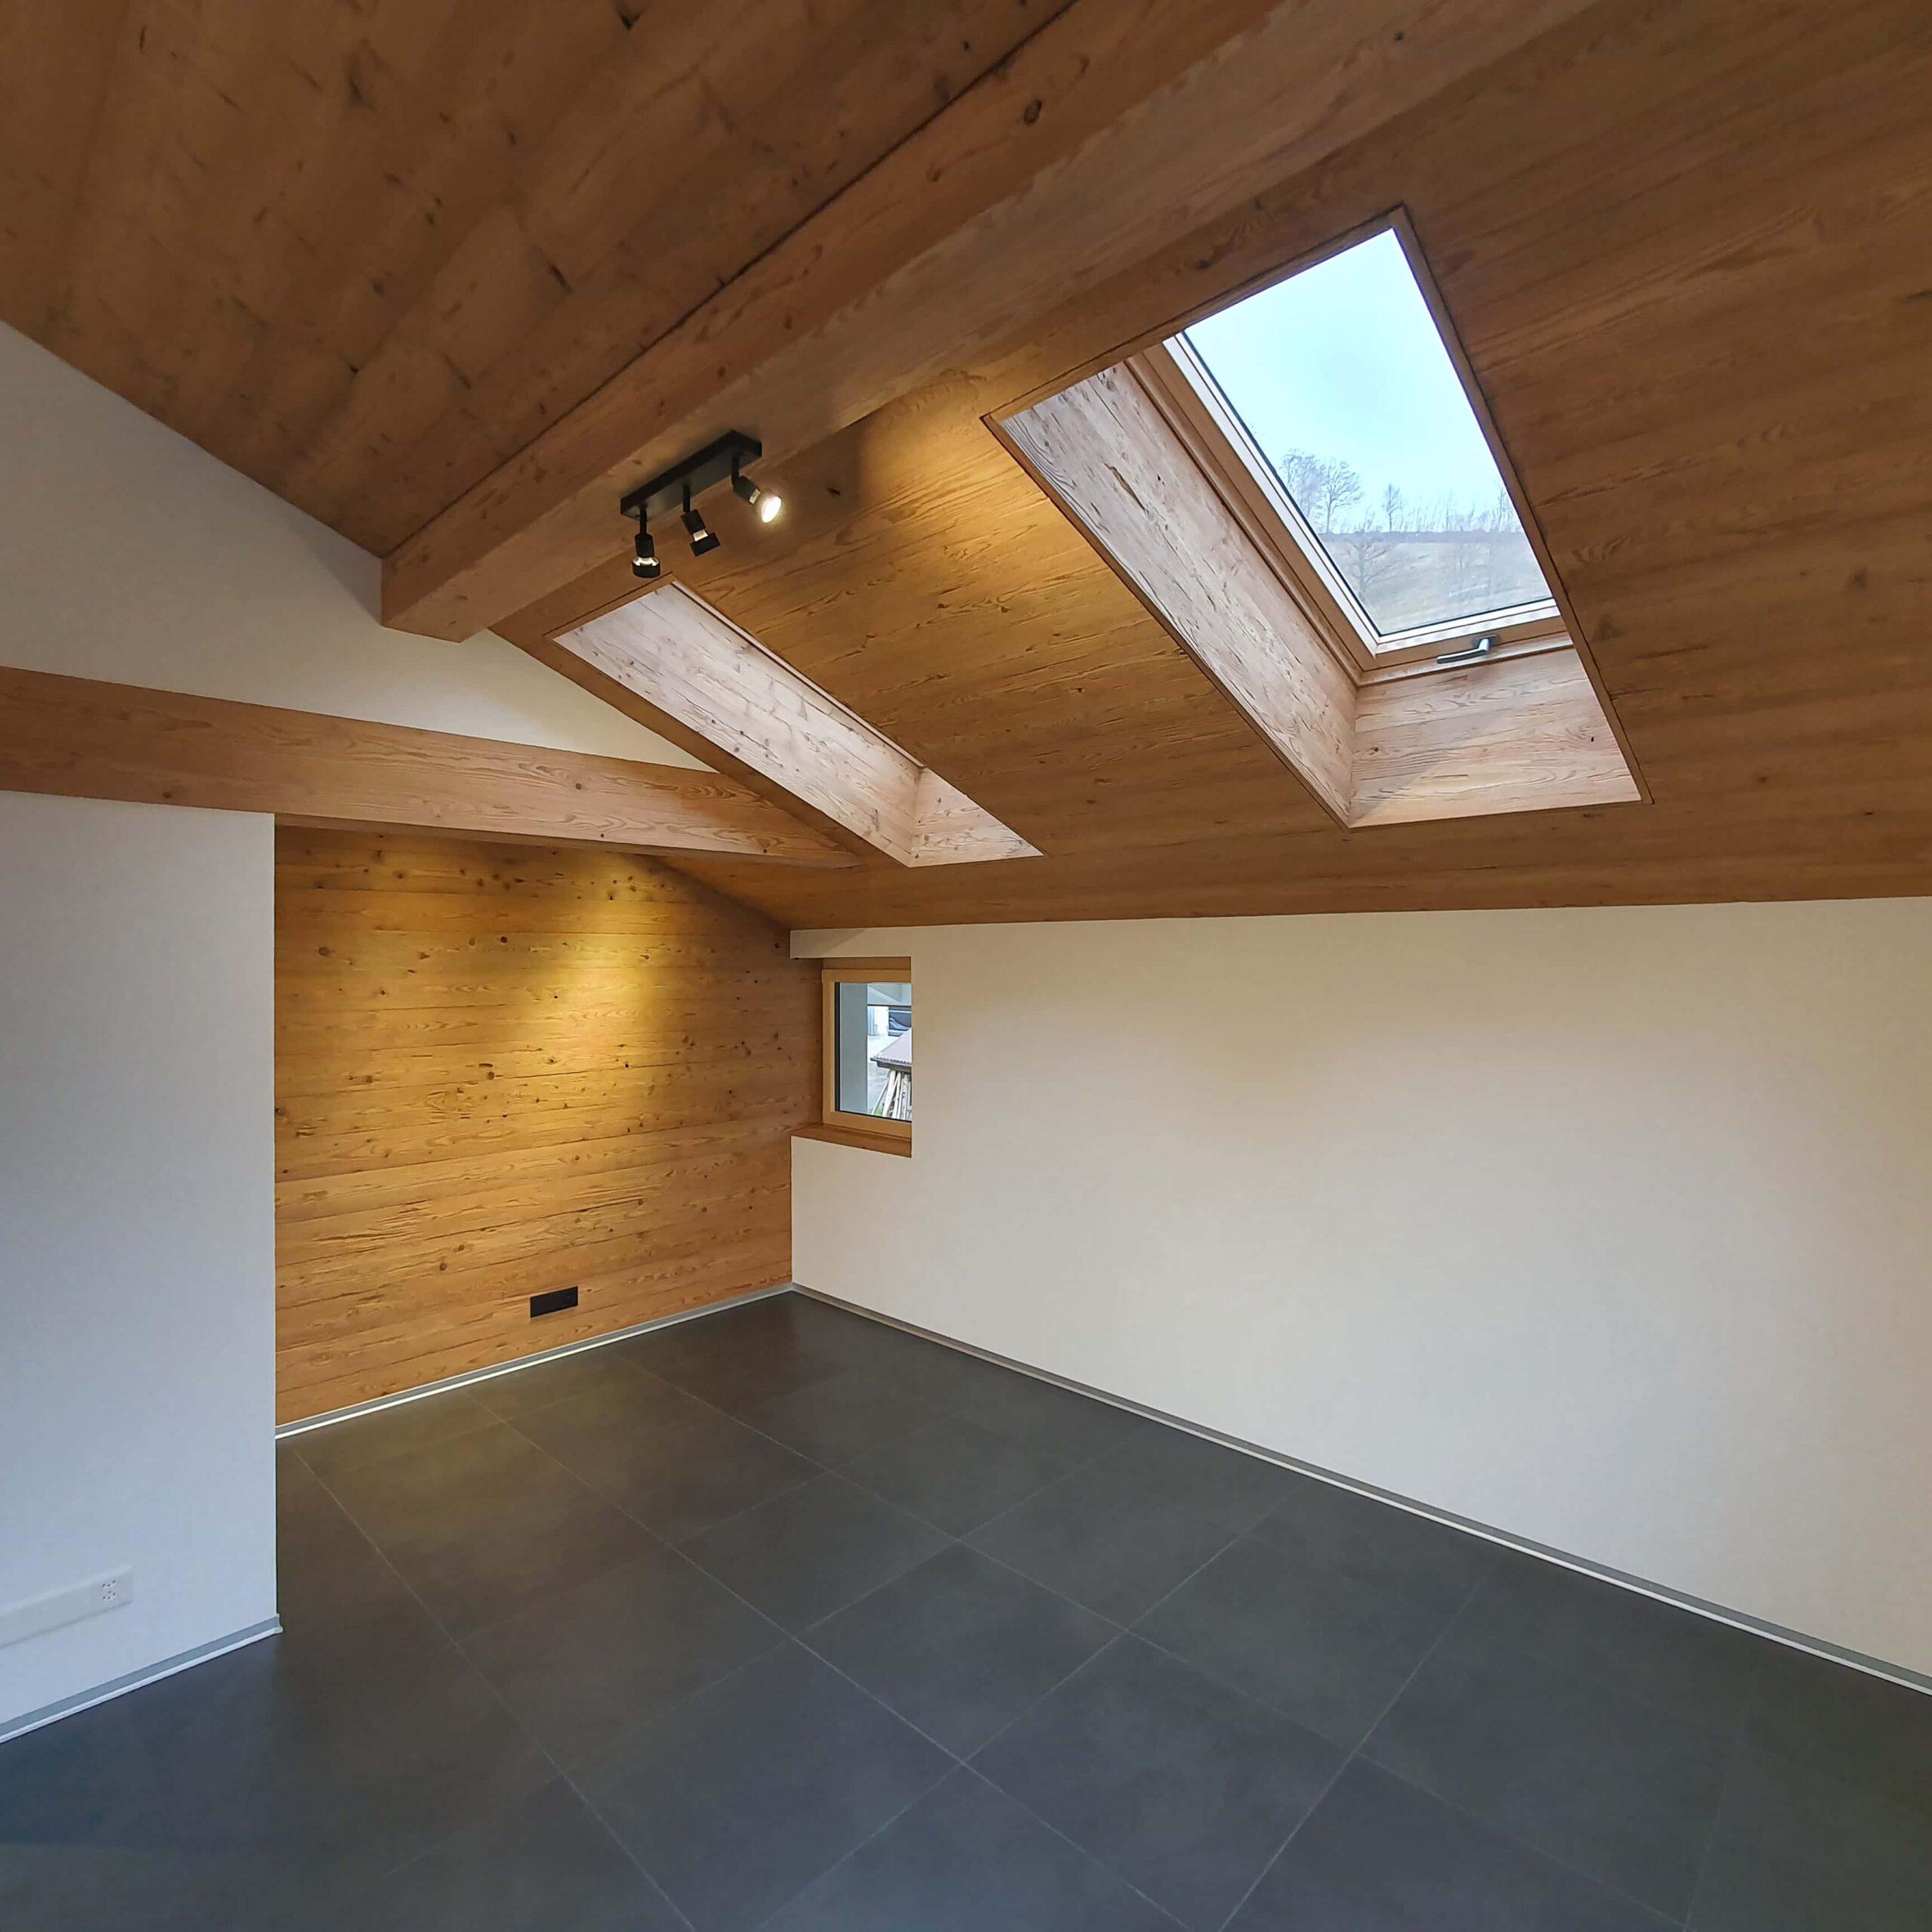 Wooddesign_Holzdesign_Altholz_rustikal_modern Holzdecke_Balkenverkleidung_Wandverkleidung_Wohnungumbau_Ausbau Wohnung (5)-min